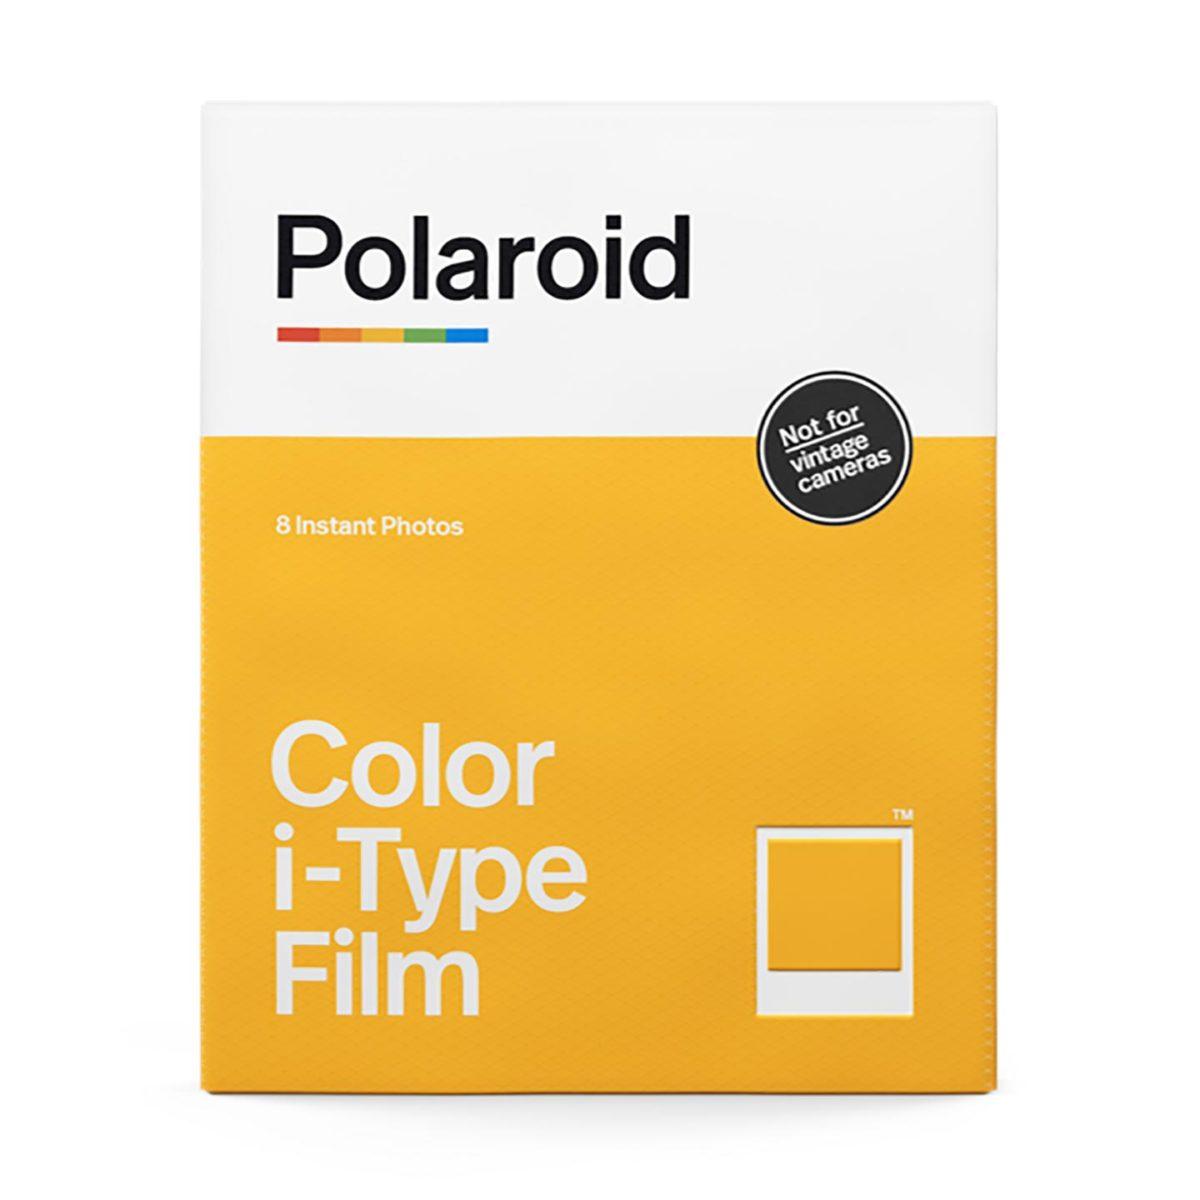 polaroid_i_type_color_film_02